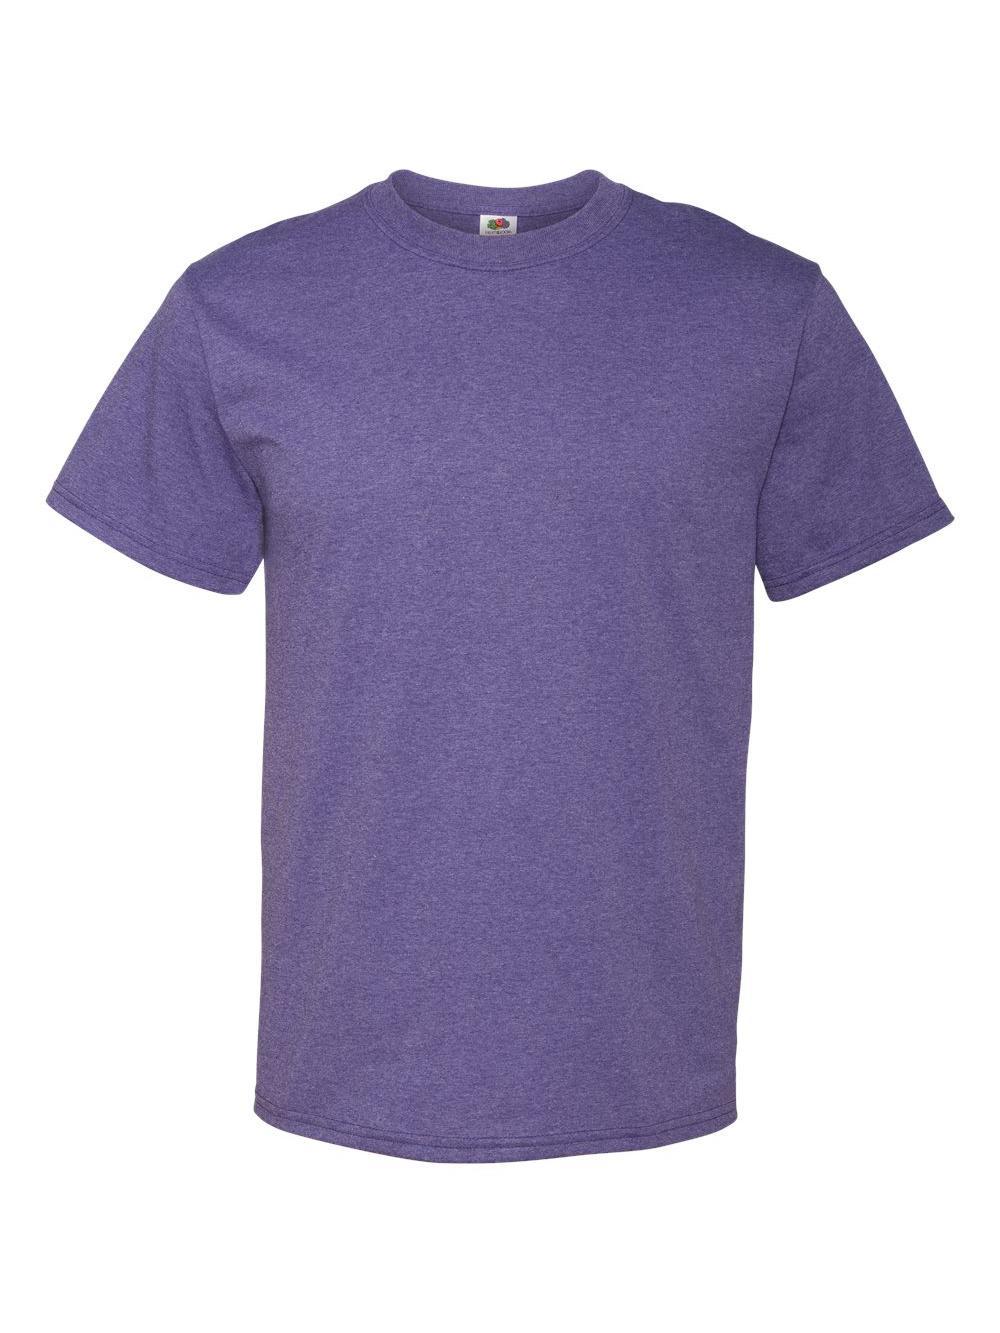 Fruit-of-the-Loom-HD-Cotton-Short-Sleeve-T-Shirt-3930R thumbnail 105